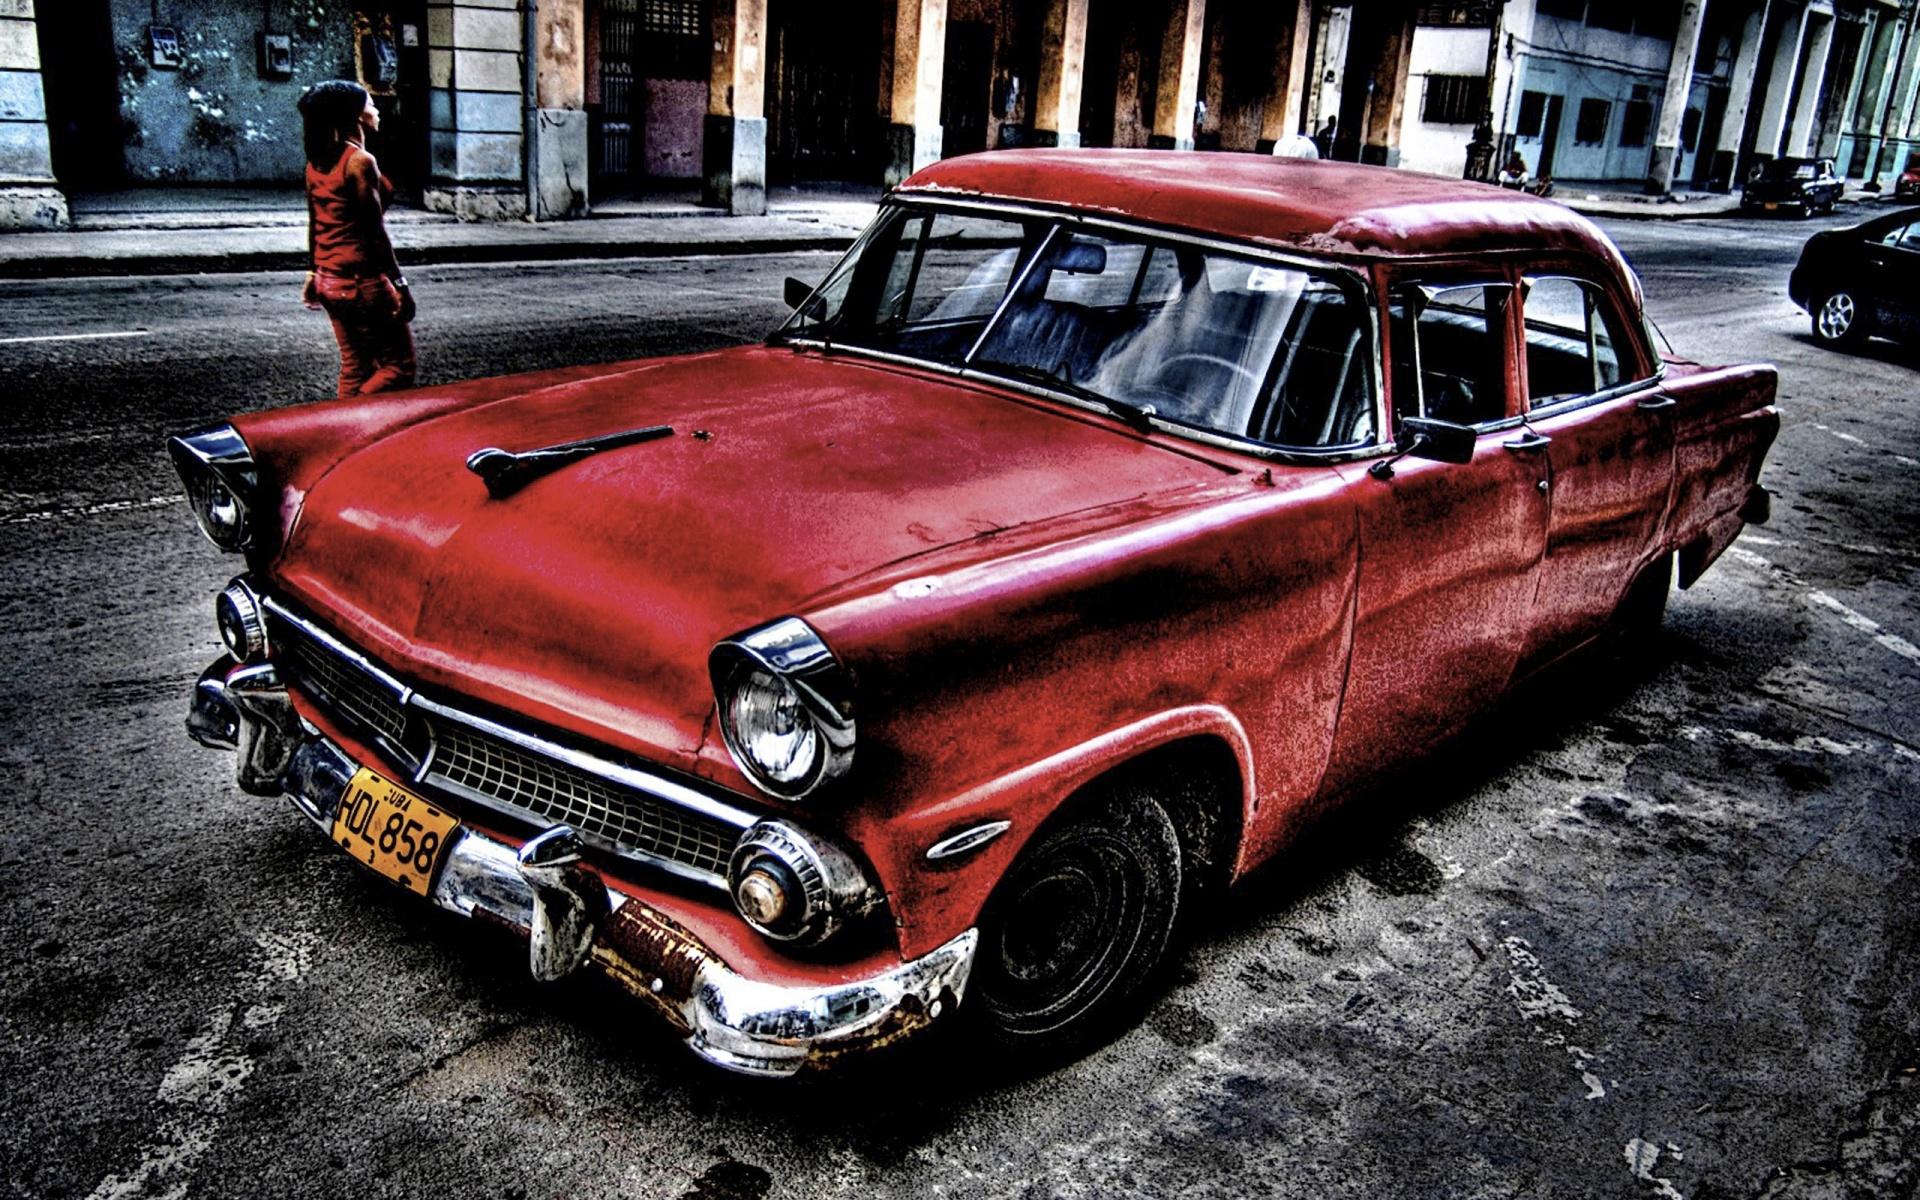 Cars wallpaper hd car wallpapers car vintage old wallpaper 4k - Classic Old Car Wallpapers 1920x1200 1086750